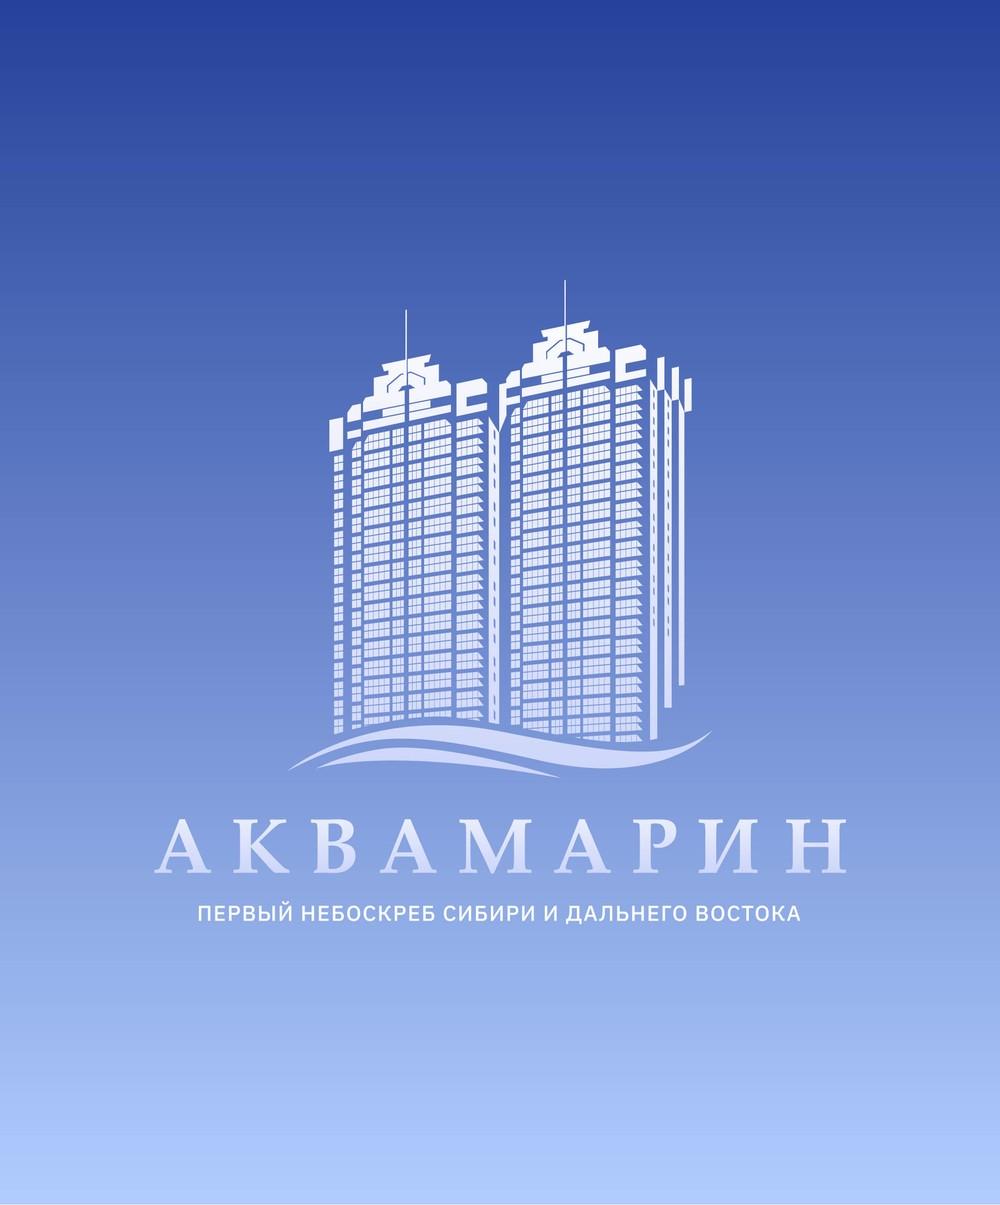 Project of Логотип для ЖК «Аквамарин»